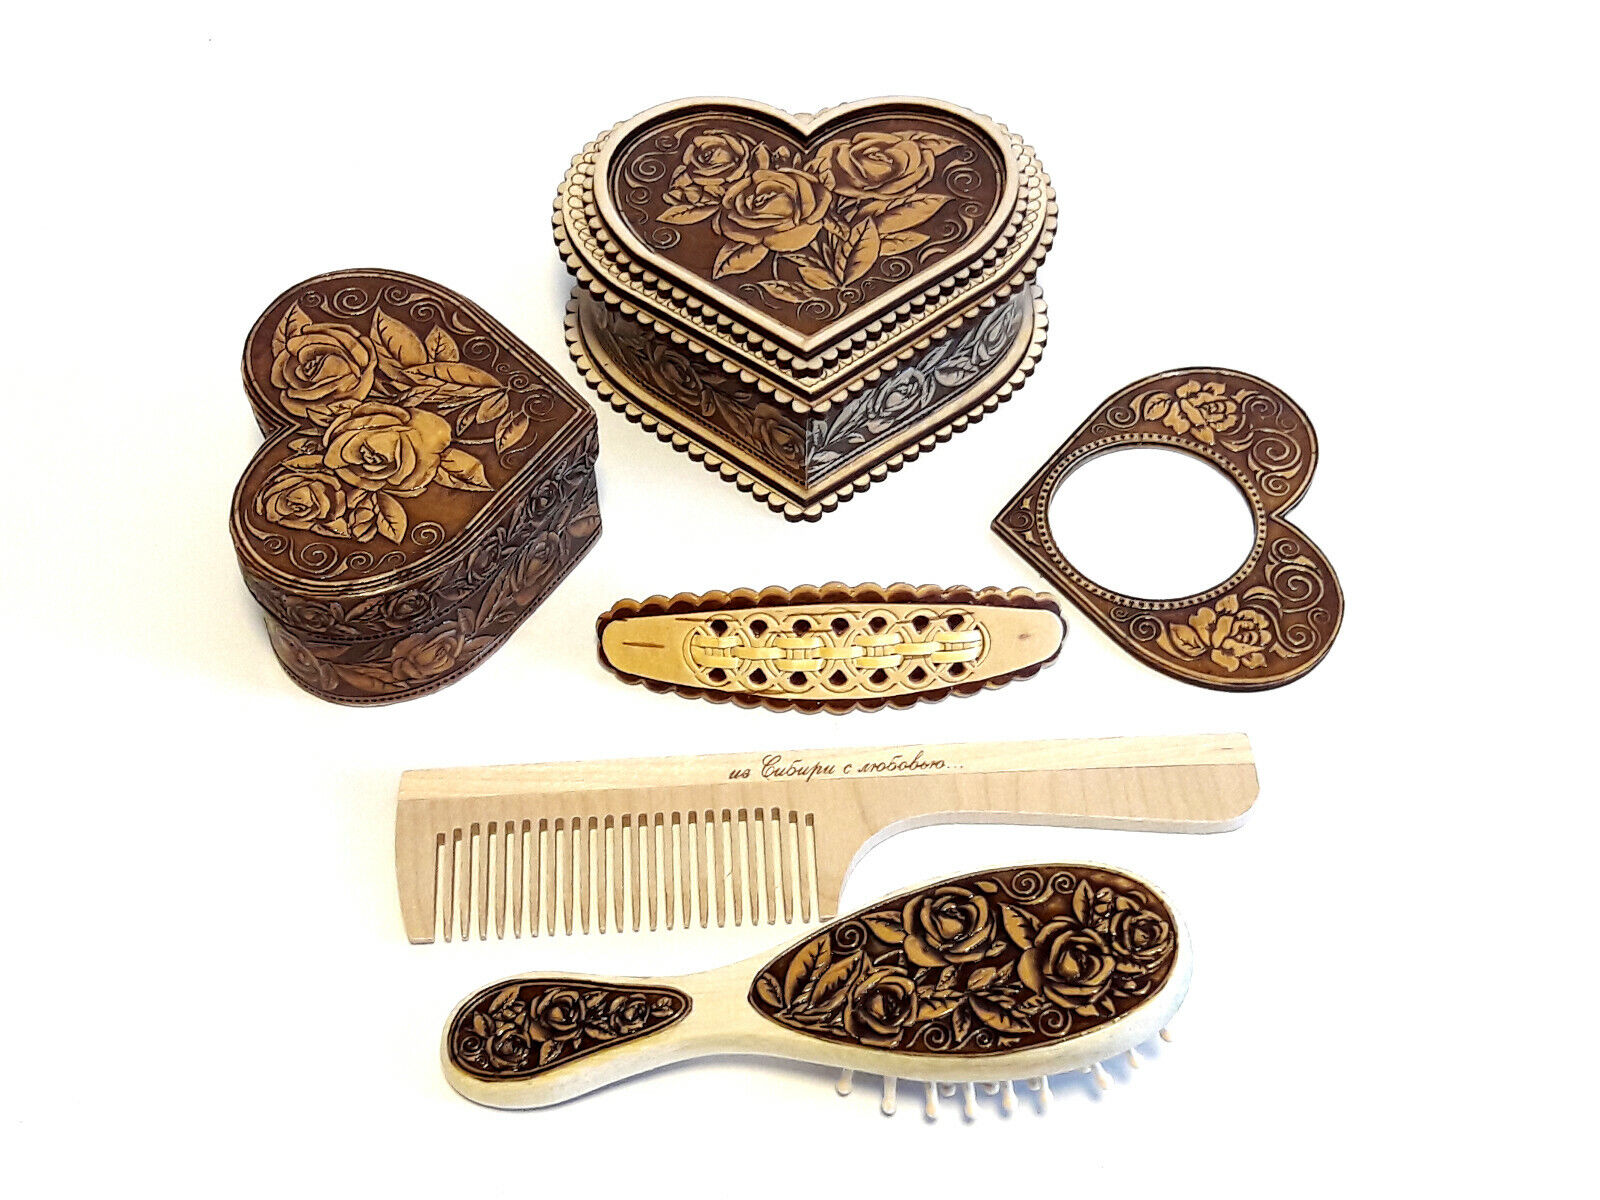 Geschenk Set Damen Set Schatullen Aufbewahrung Set Haarpflege Set Organikprodukt